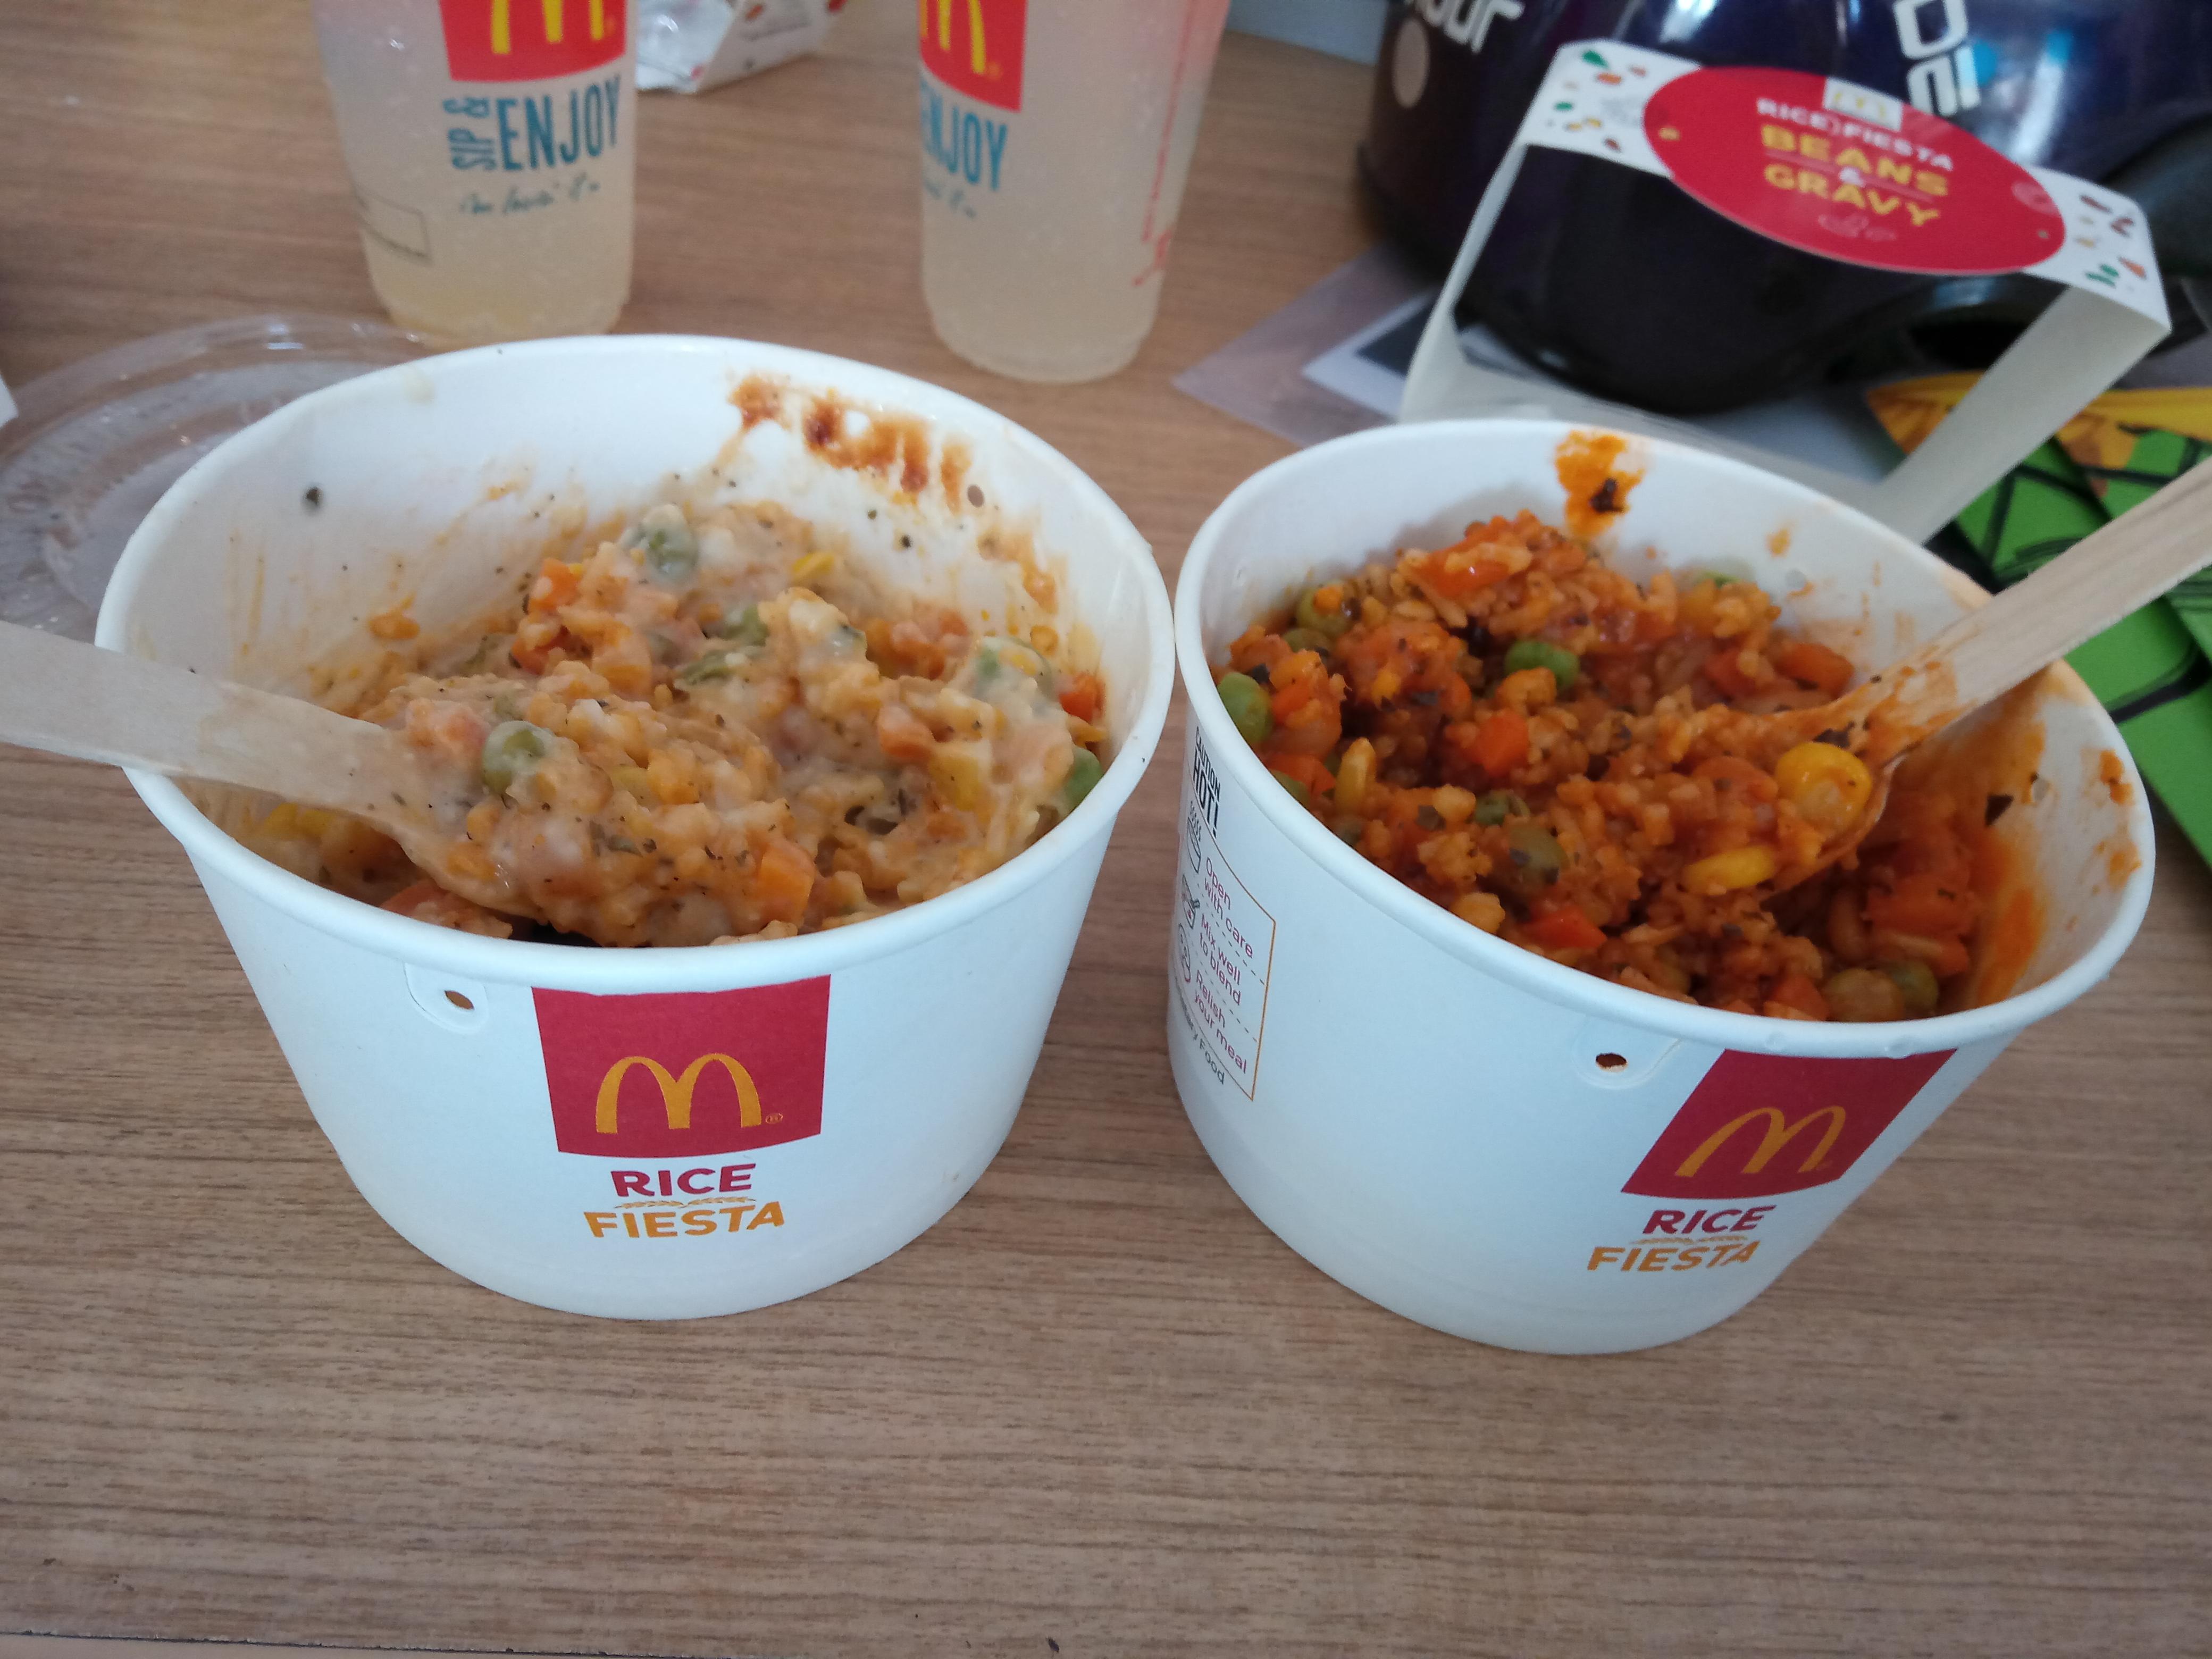 McDonalds introduces rice in Chennai, India